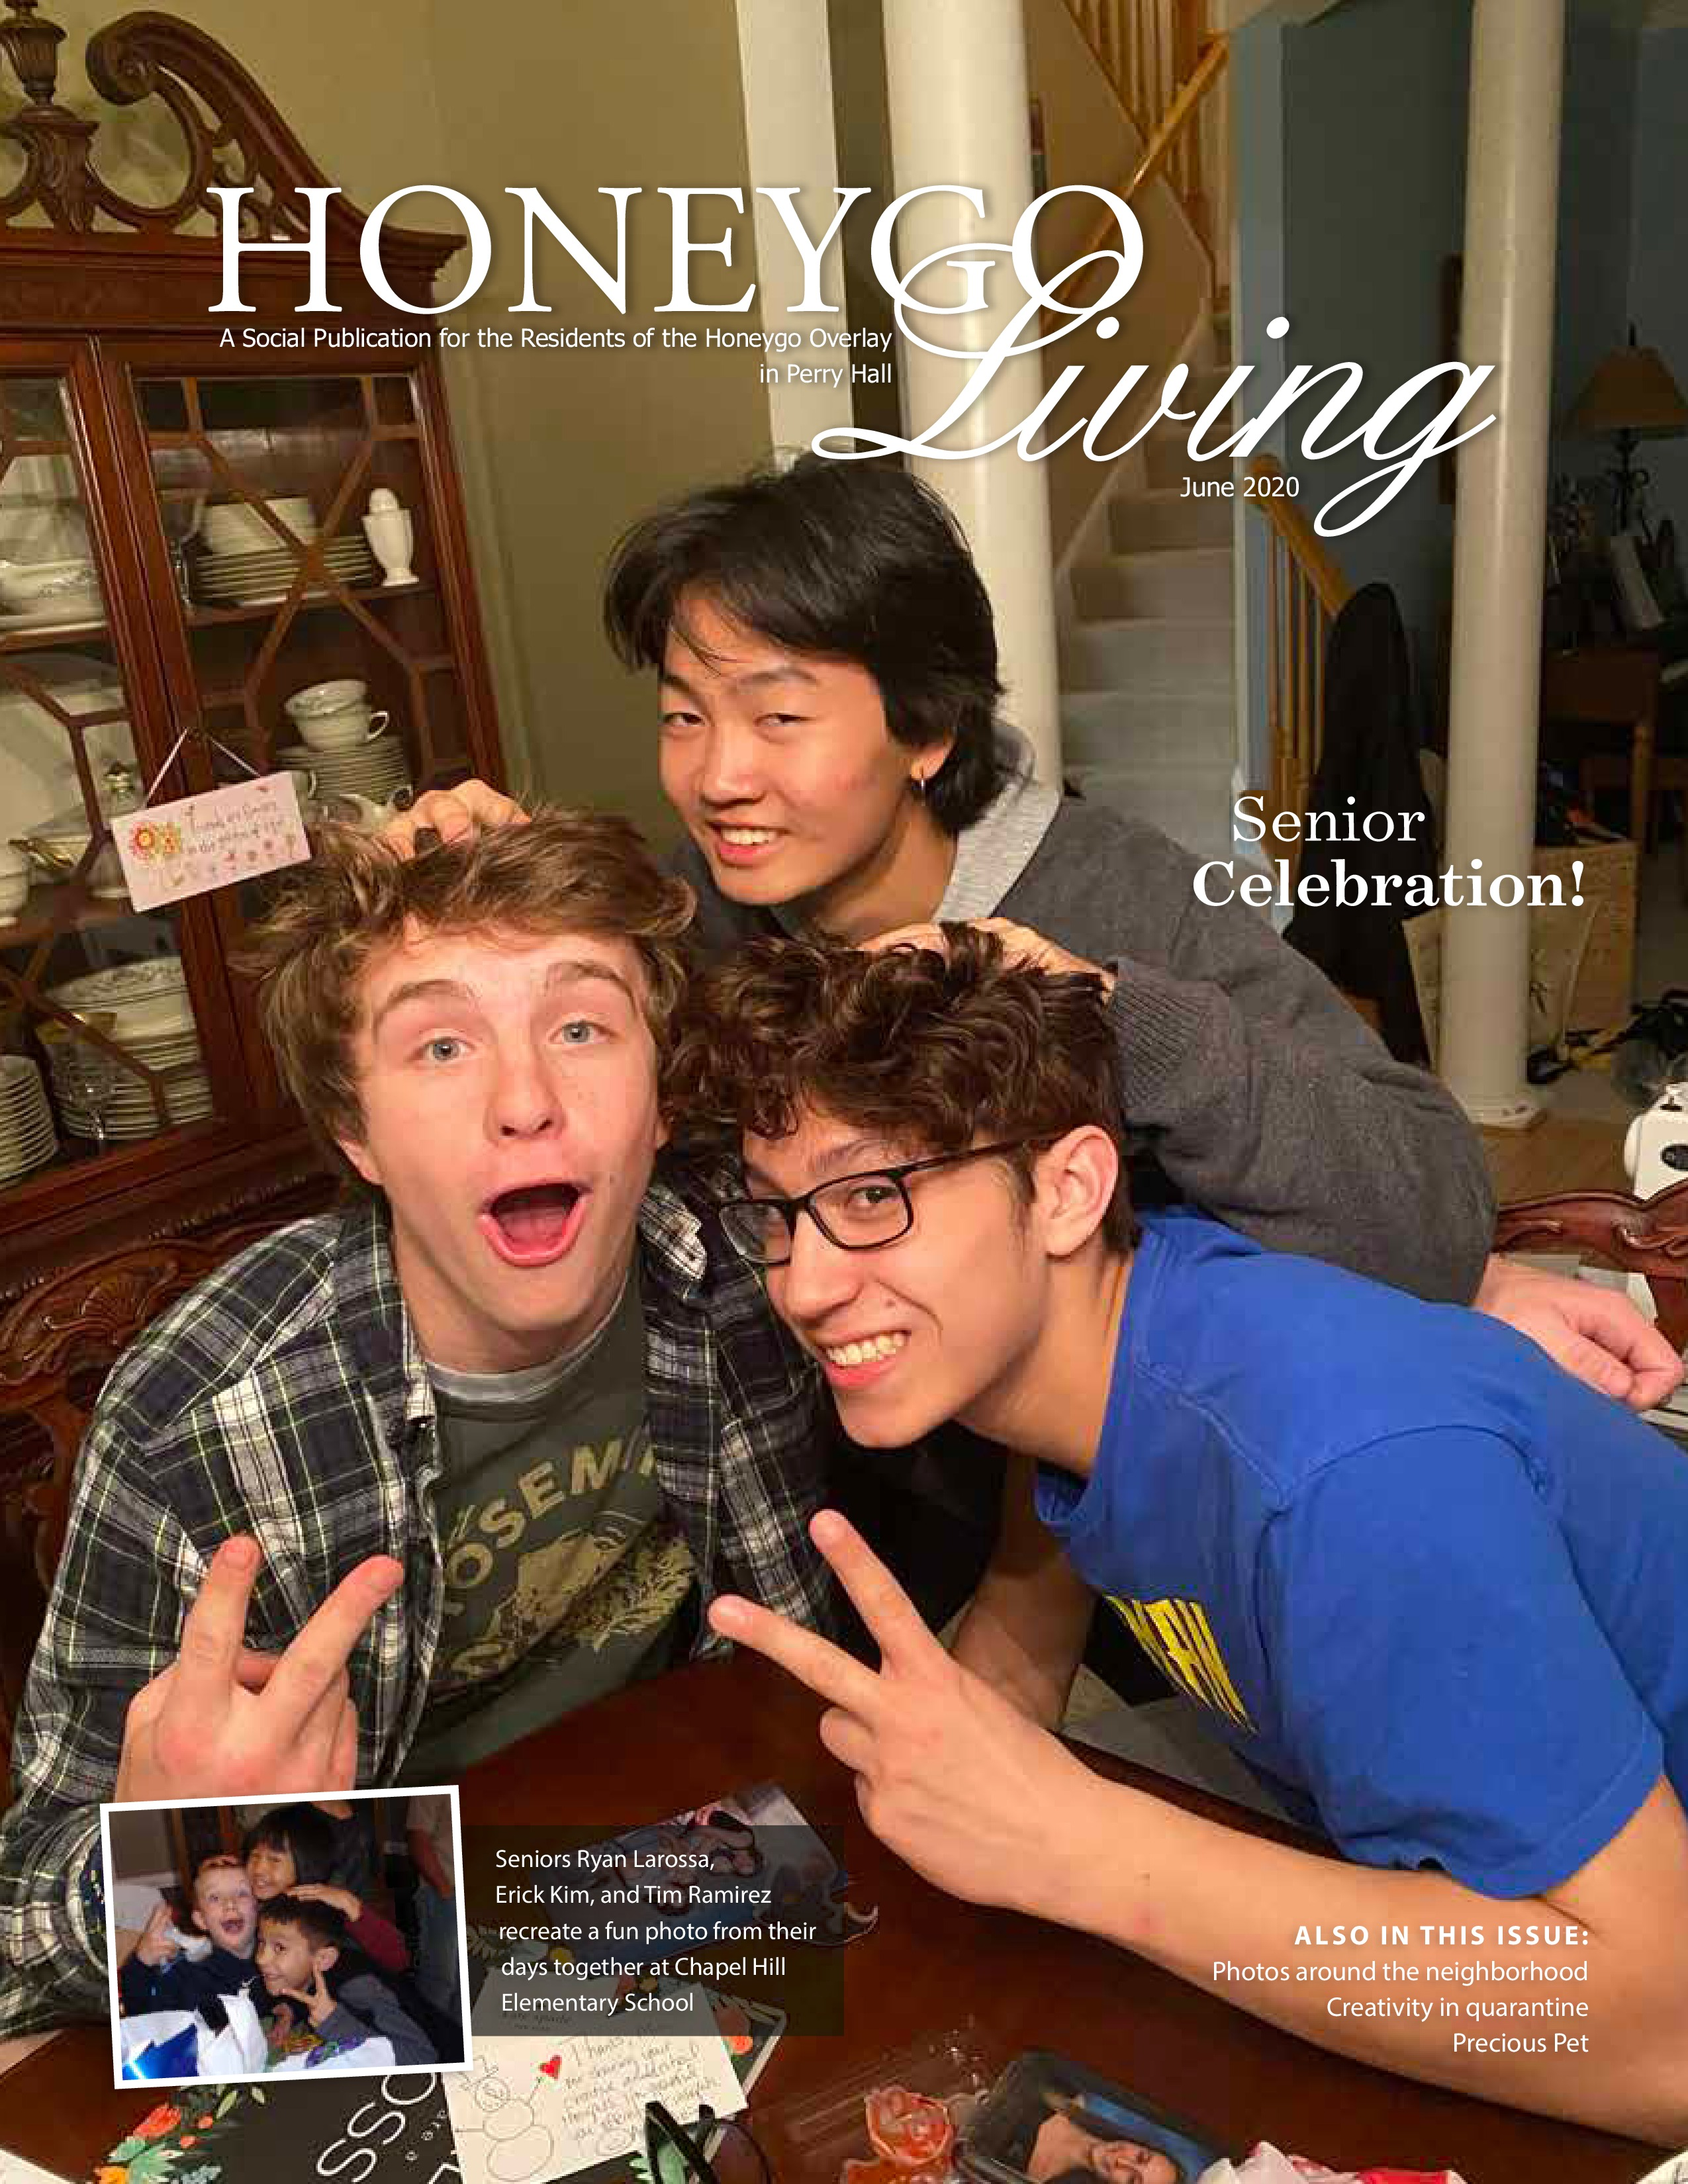 Jun 2020 honeygo living page 1